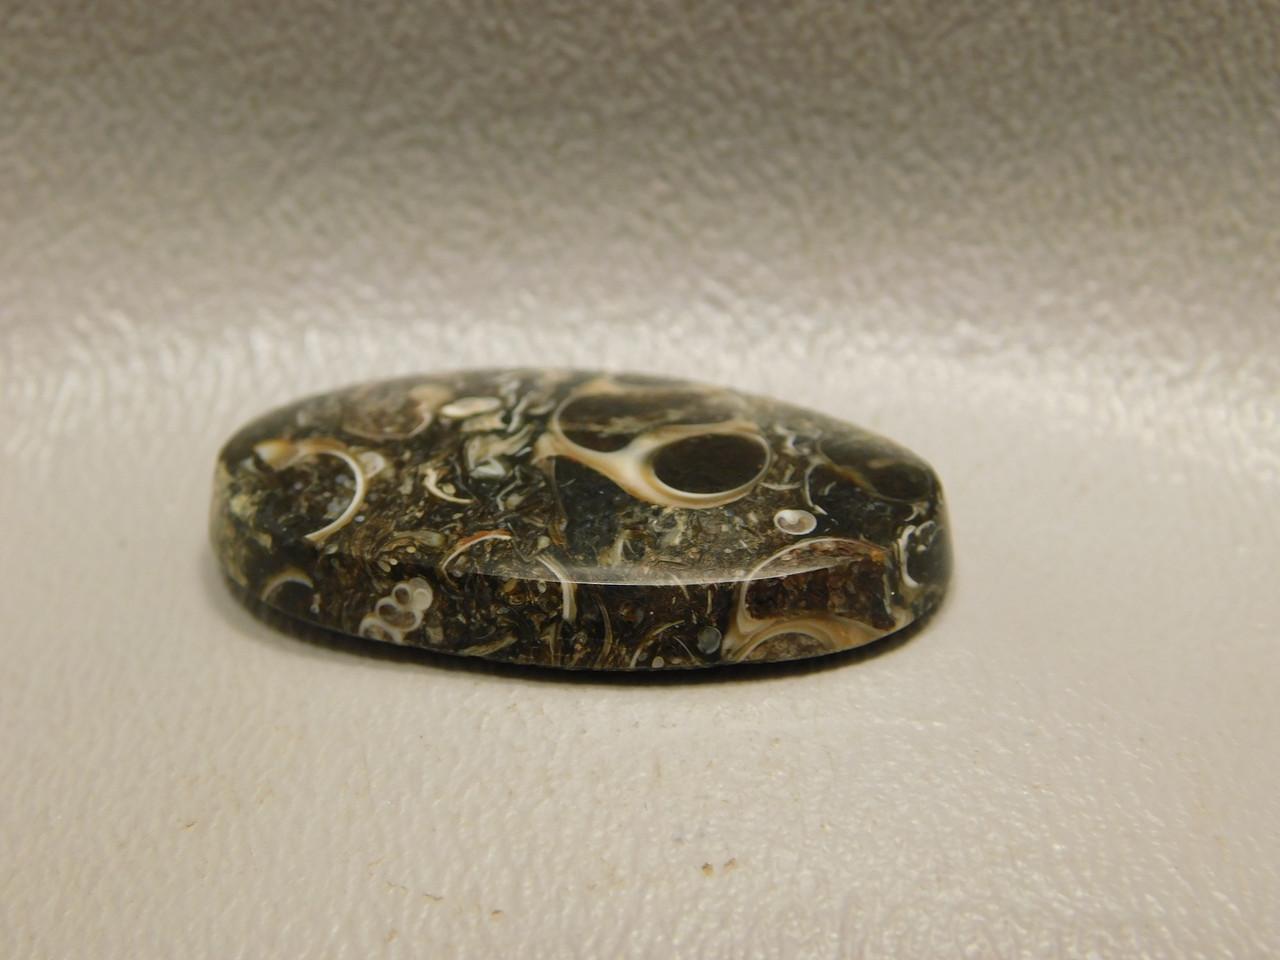 Turritella Agate Loose Stone Fossilized Cabochon #20